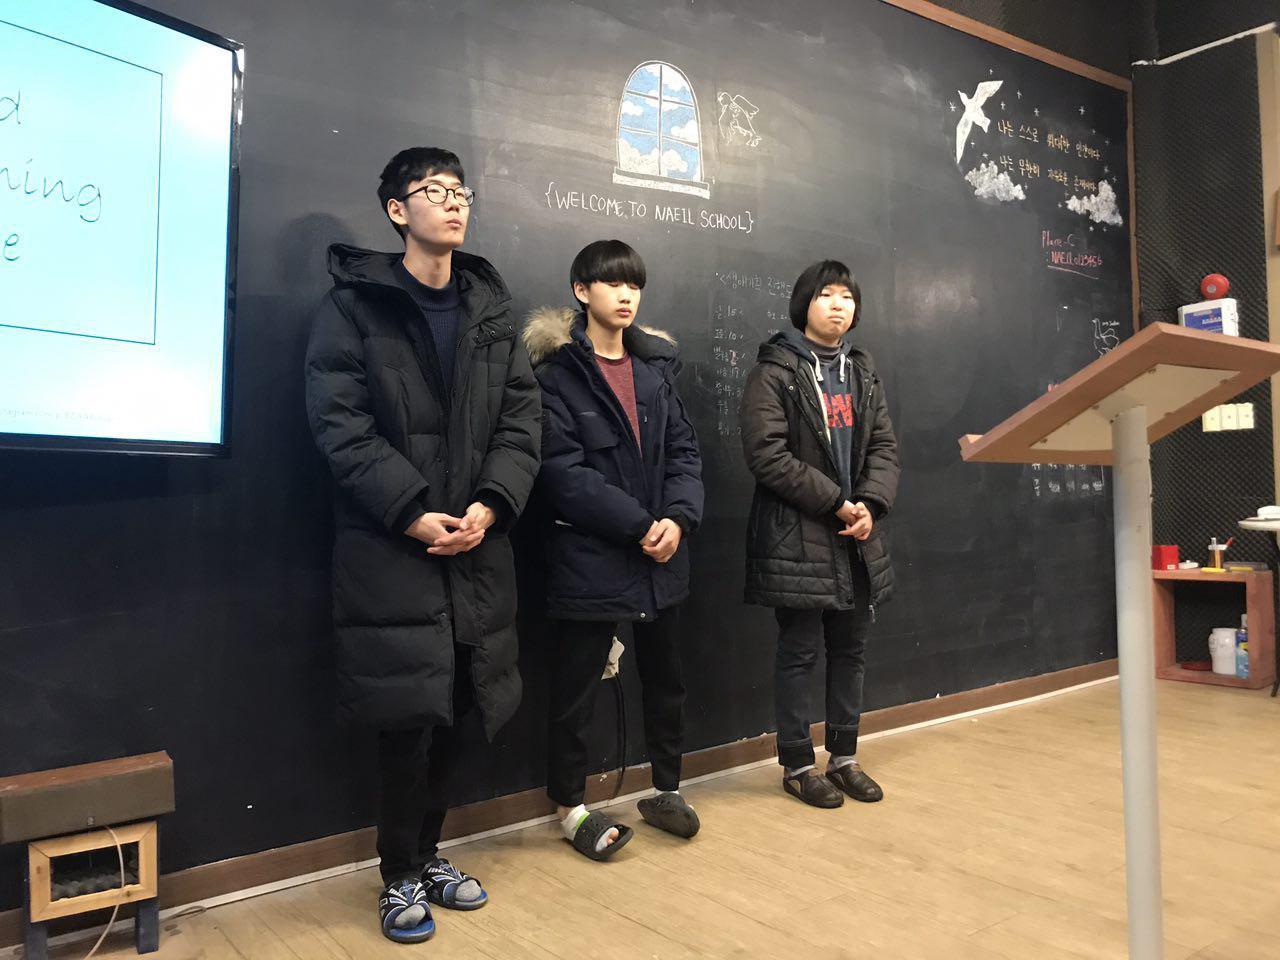 photo_2018-02-28_17-45-24.jpg